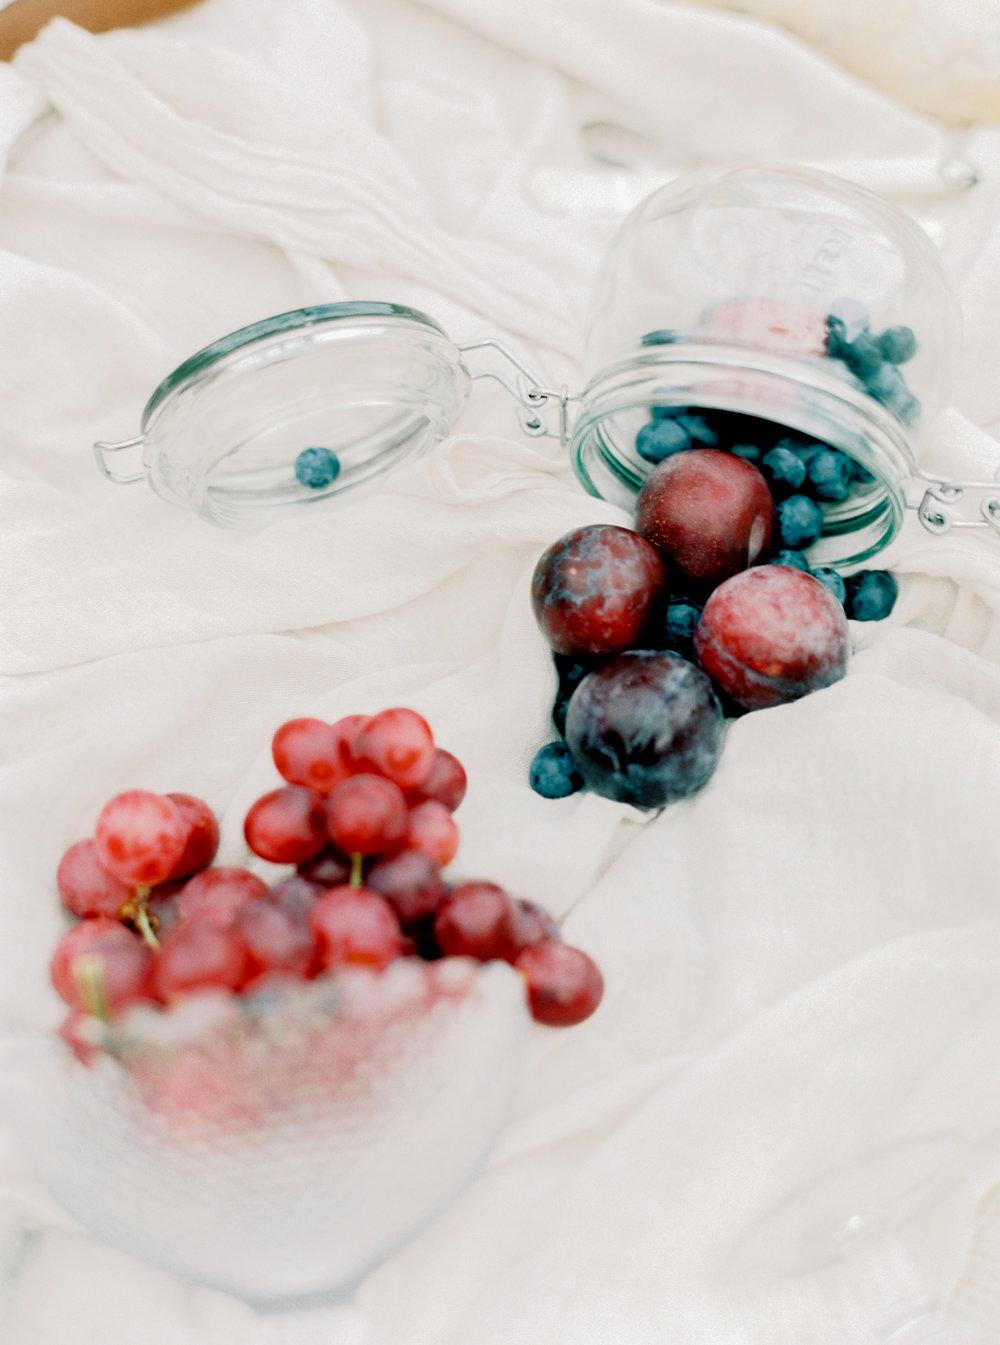 Luxury Wedding Planner UK | Our Chic & Romantic Engagement Shoot in Bath | Katie Julia Photography - 15.JPG